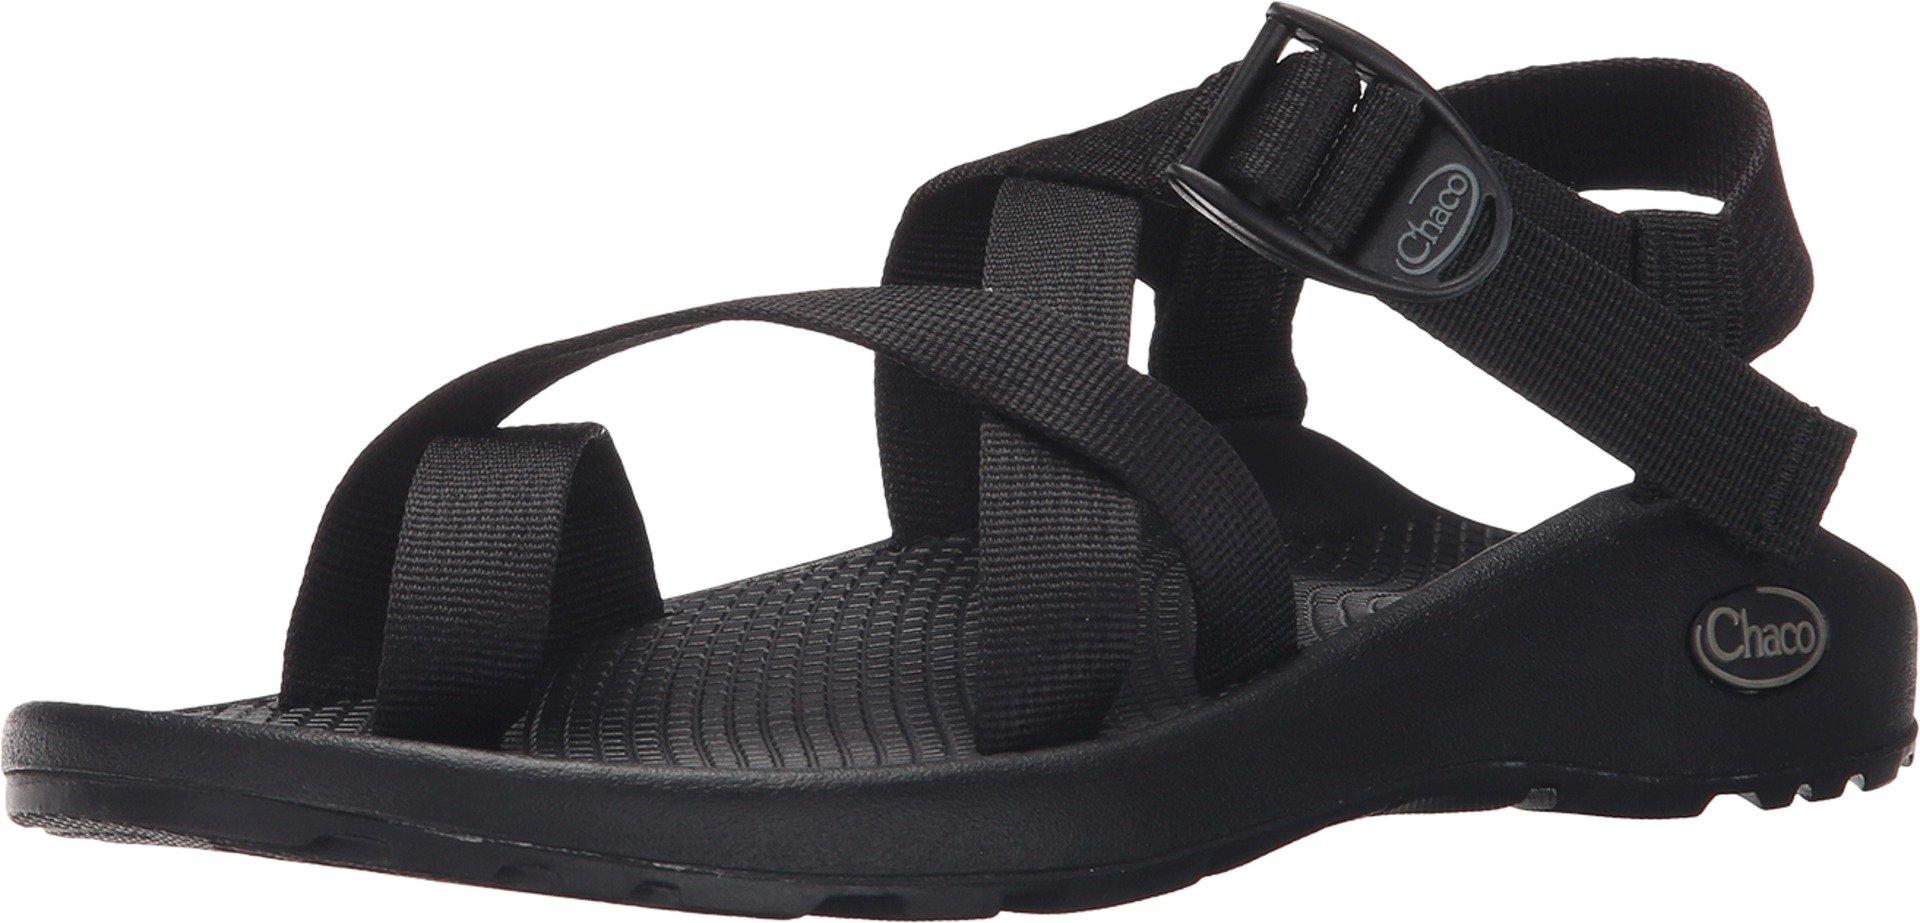 Chaco Z2 Classic Sandal - Women's Black 10